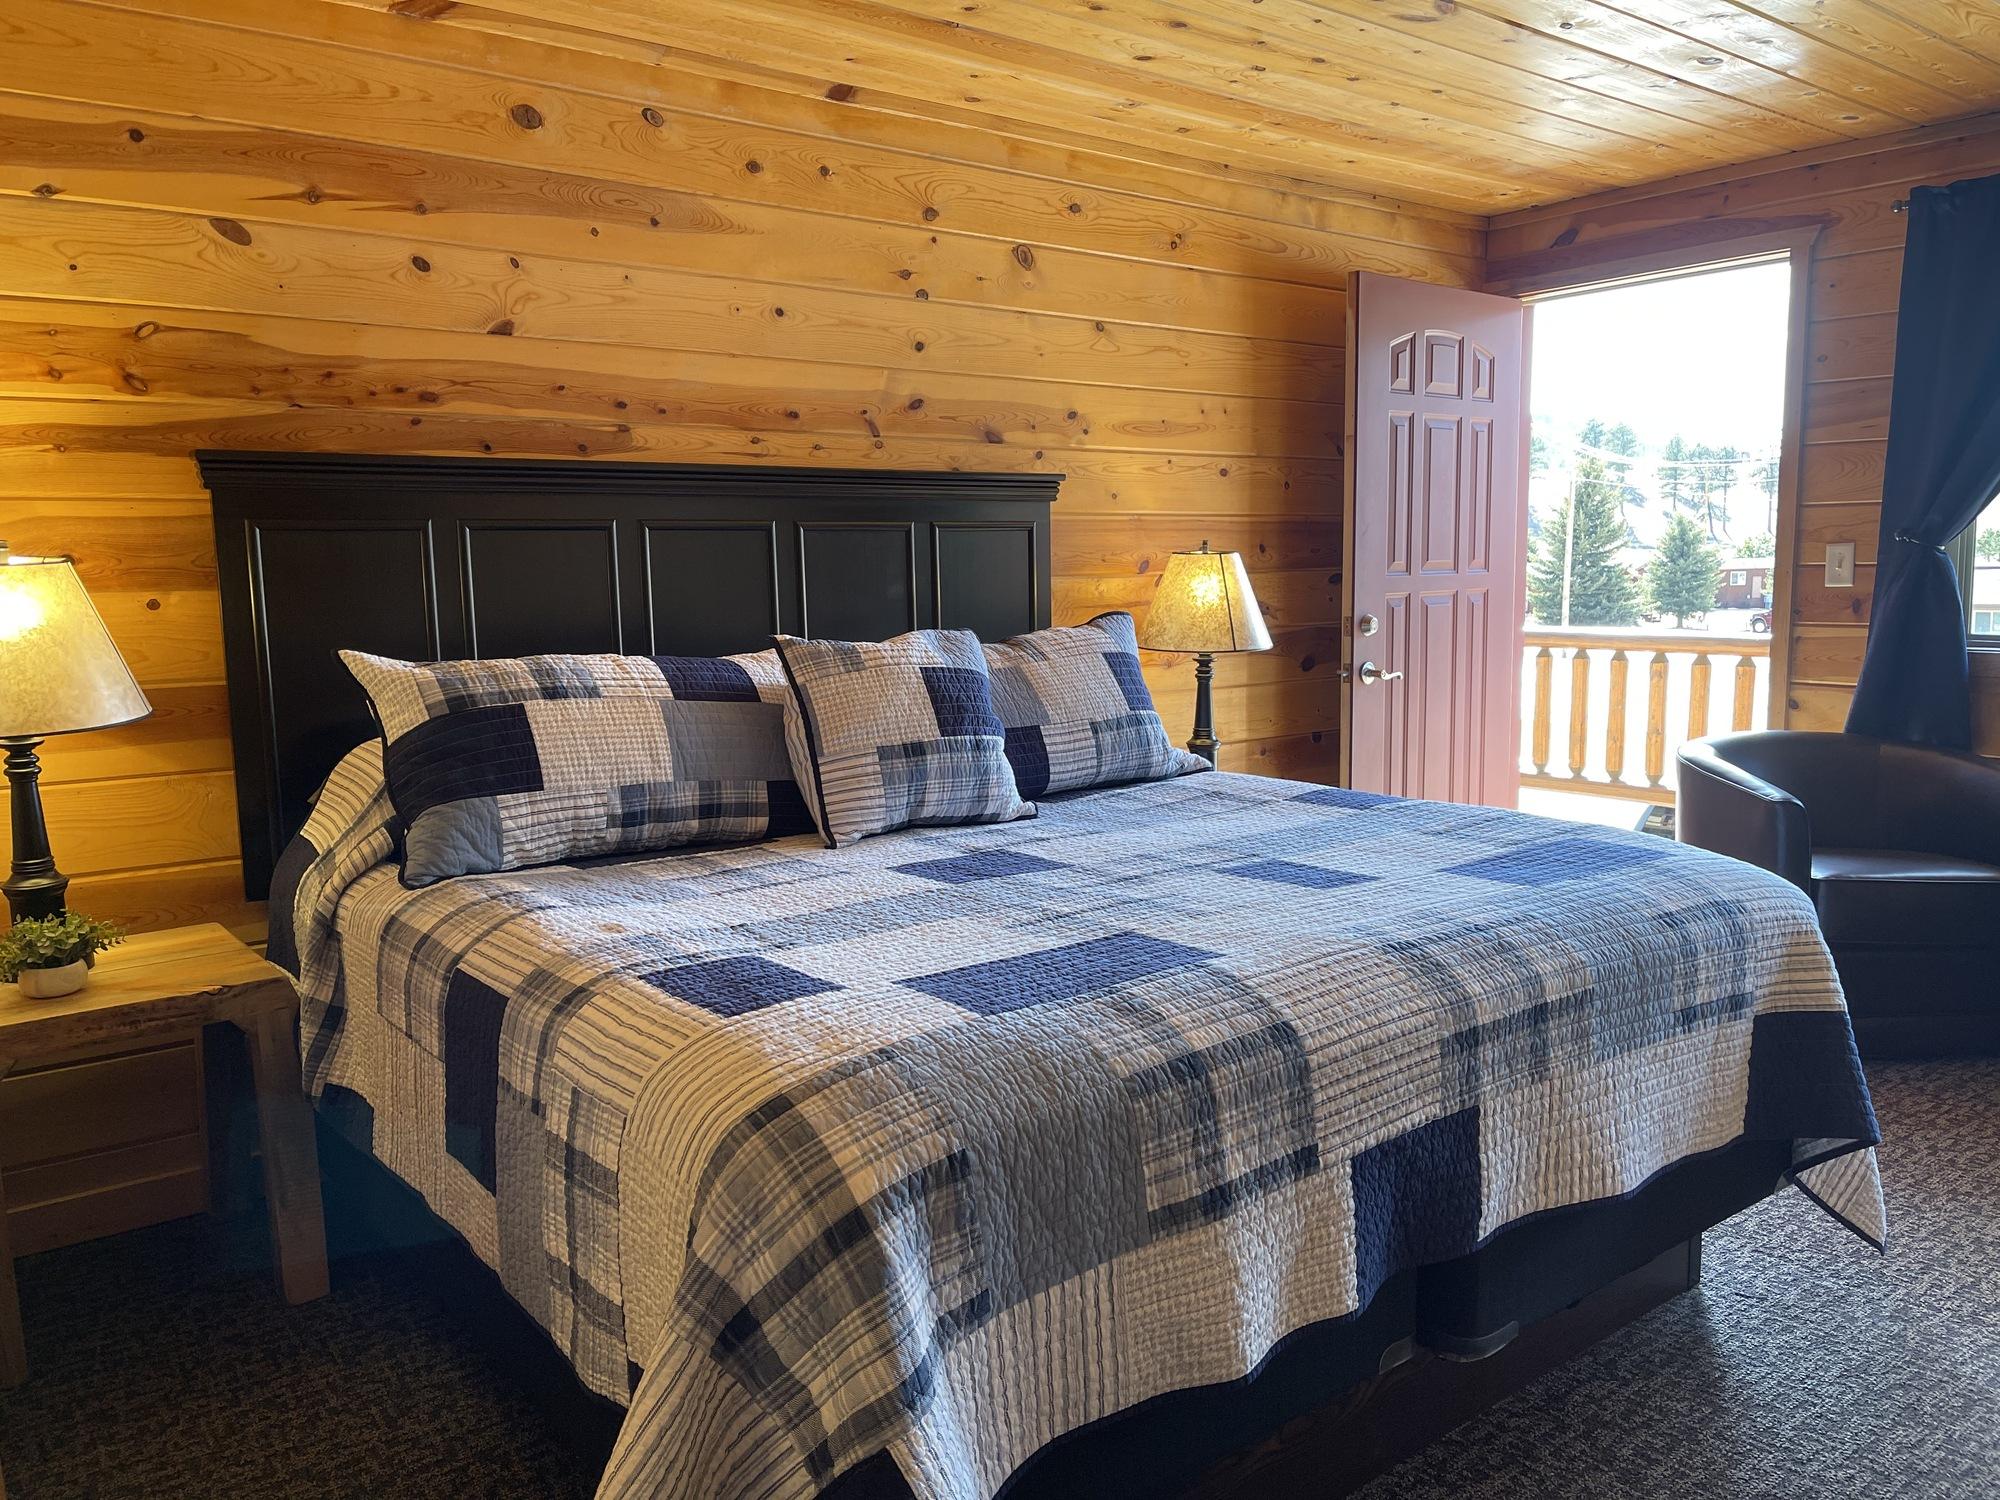 Image for King Room - Lodge